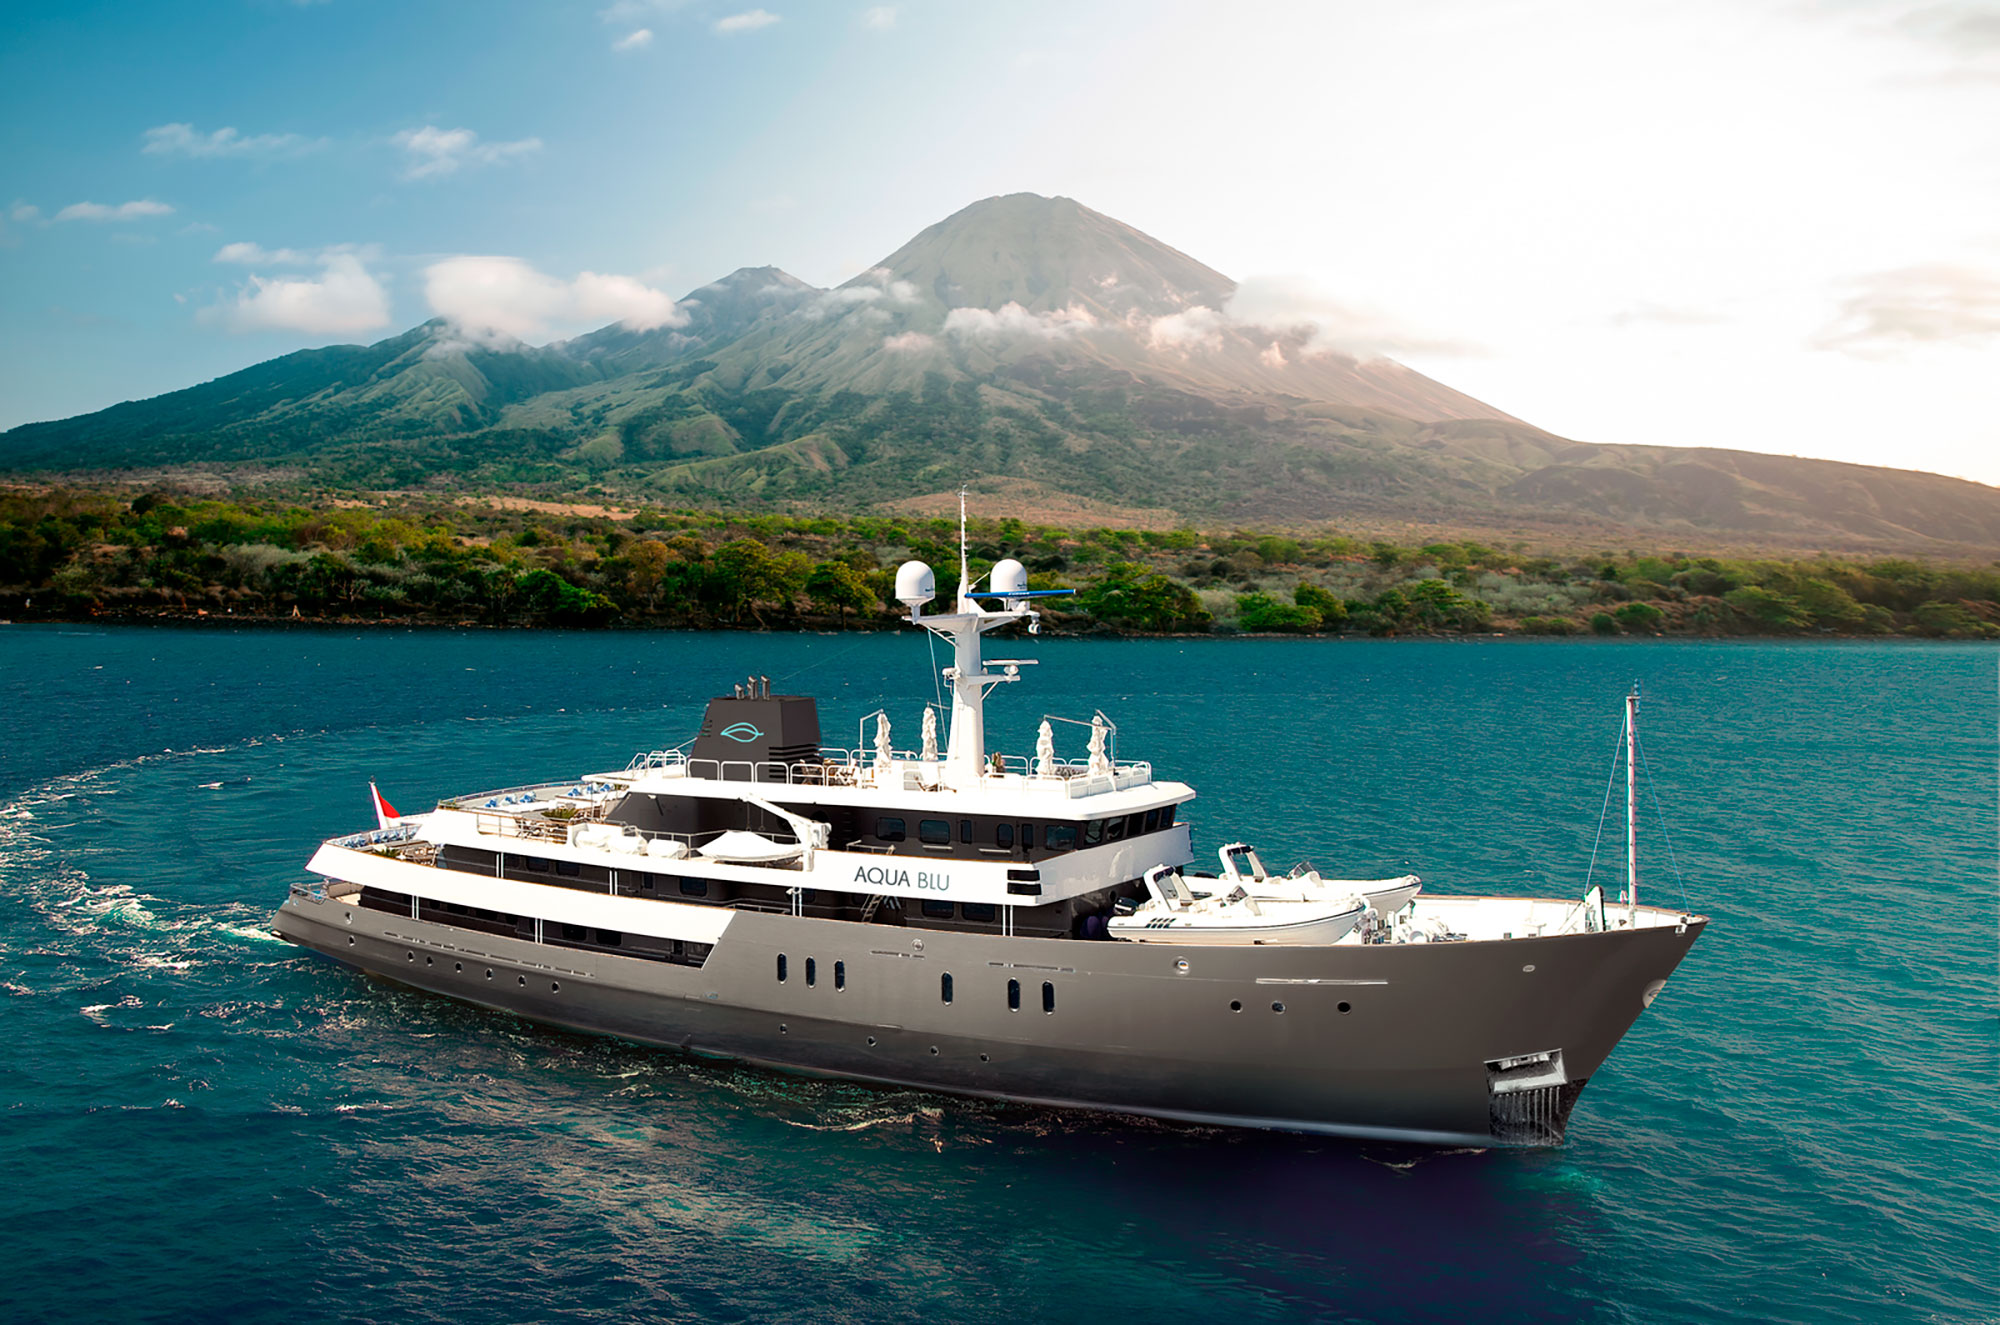 Crucero AQUA BLU de 12 noches - Flores to Spice Islands - Indonesia- imagen #1